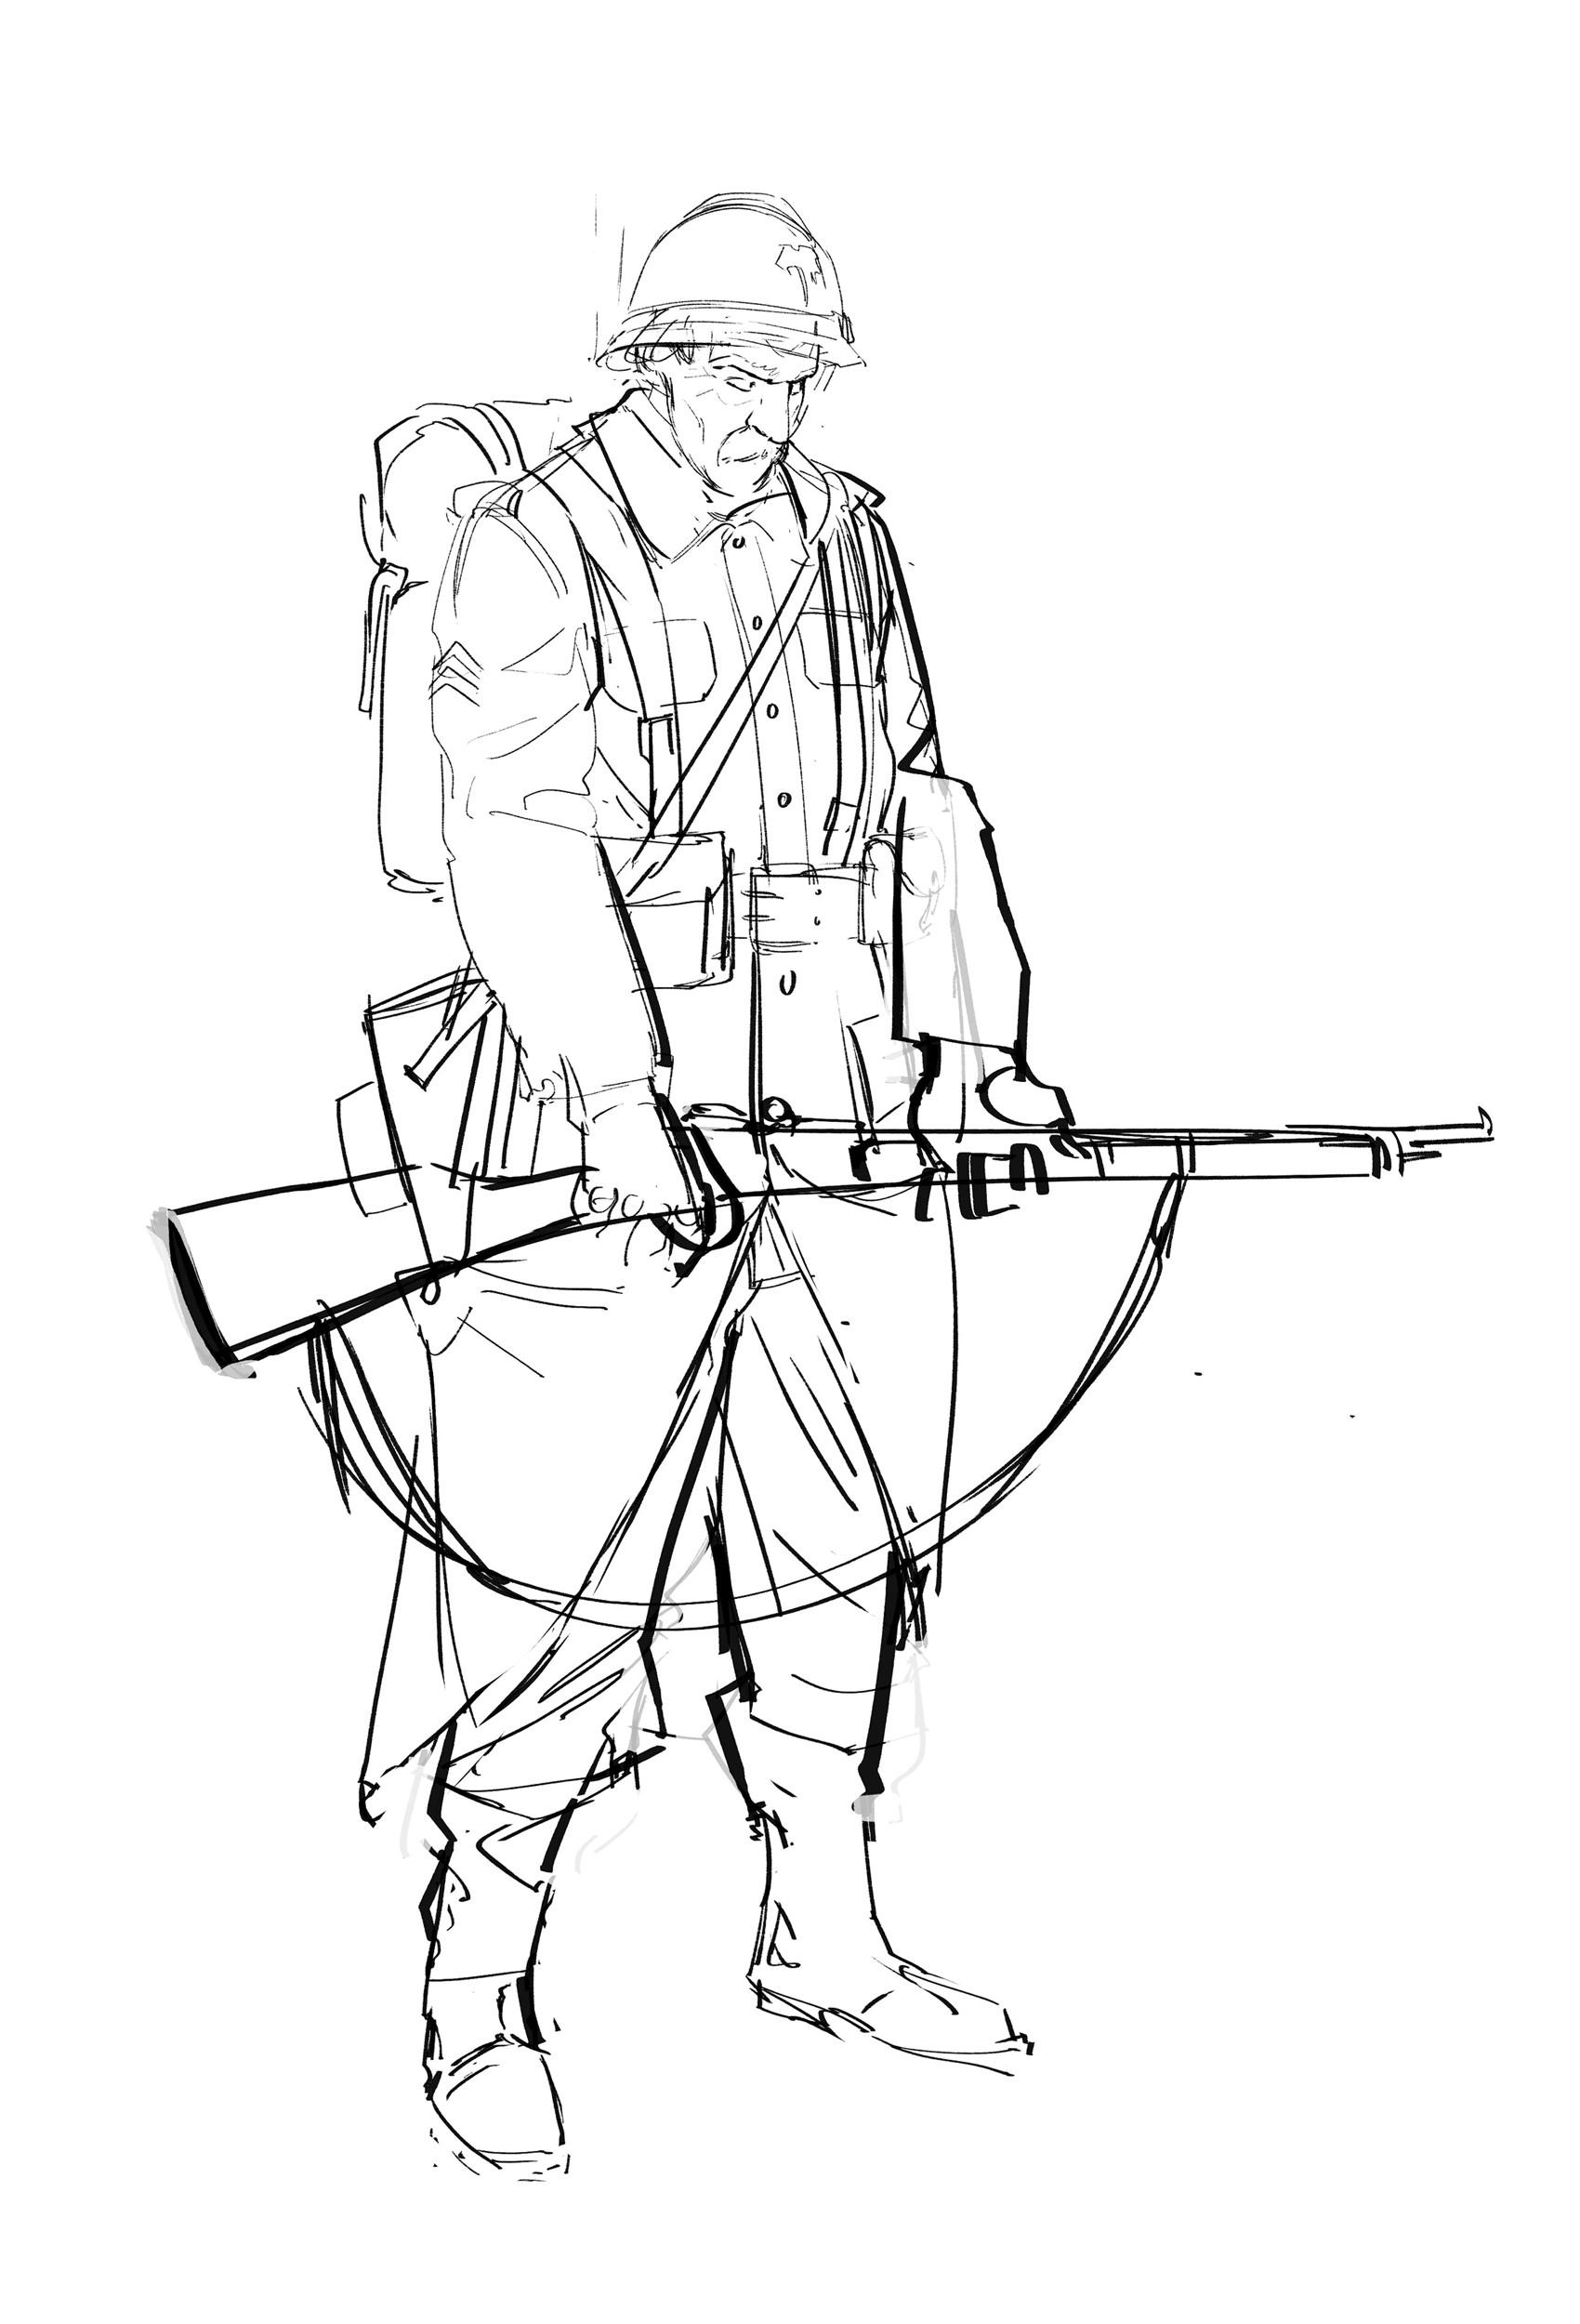 Nicolas petrimaux ww1 soldier 03